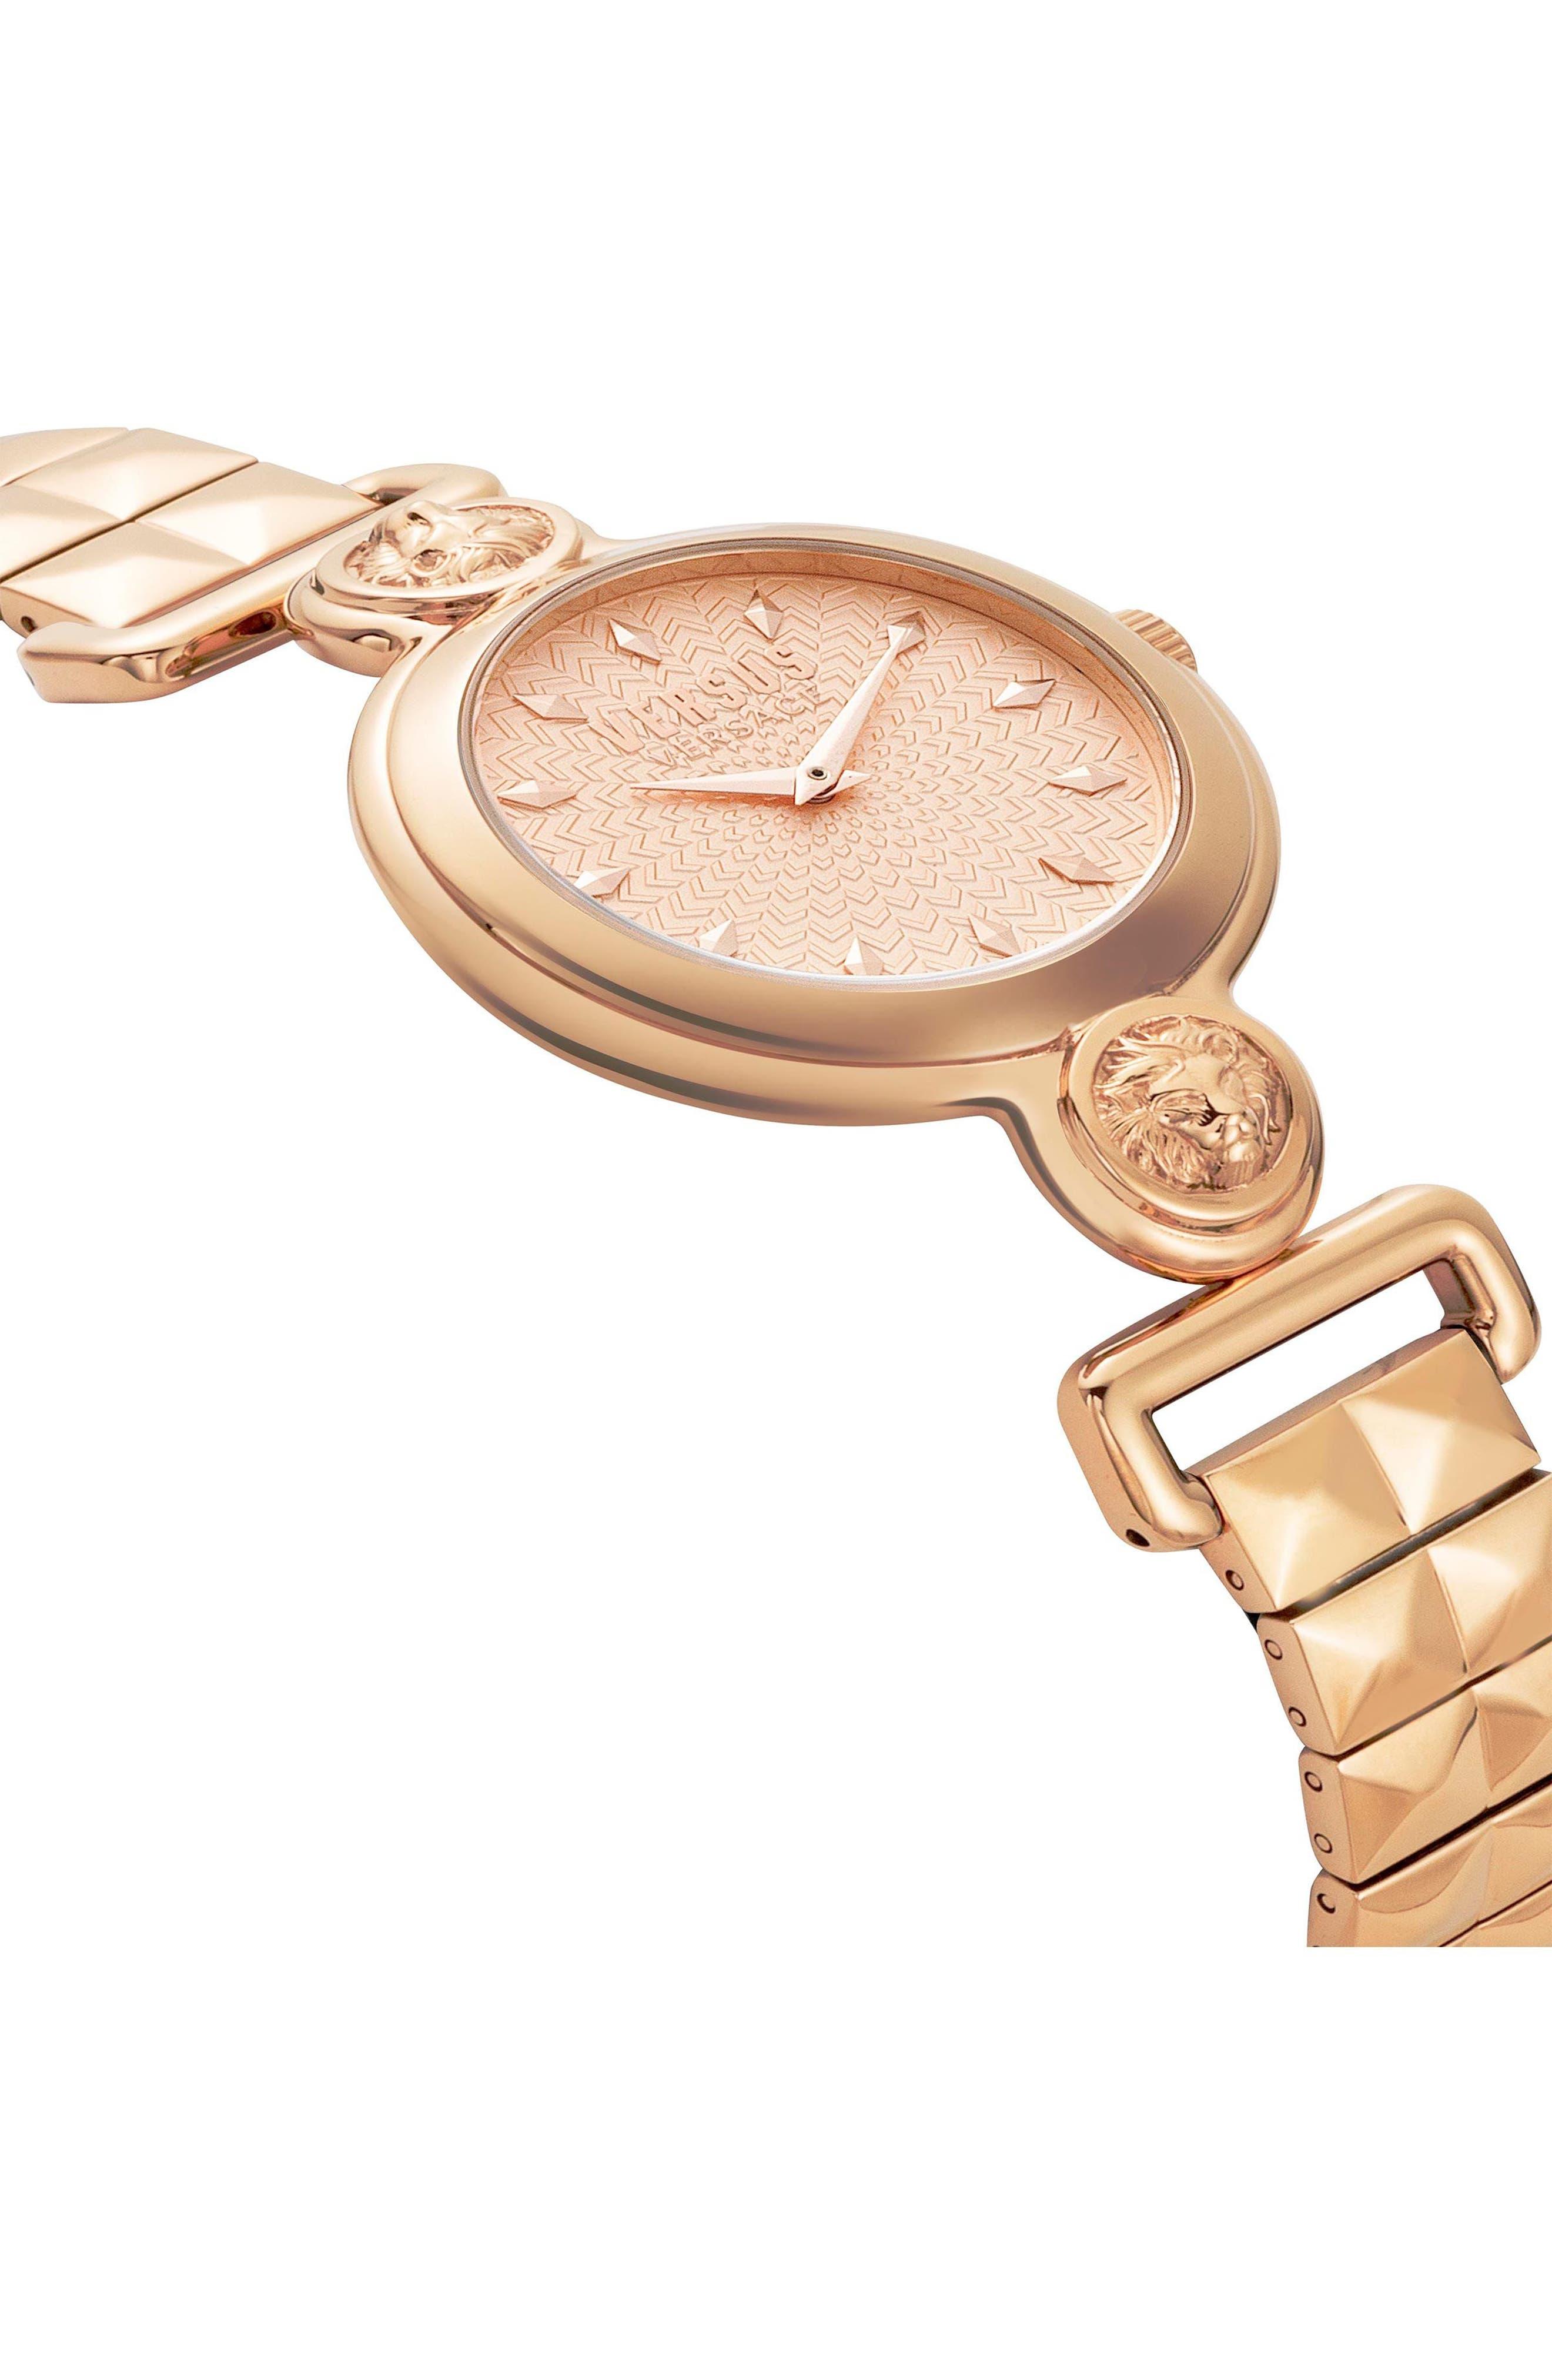 VERSUS by Versace Sunnyridge Bracelet Watch, 34mm,                             Alternate thumbnail 9, color,